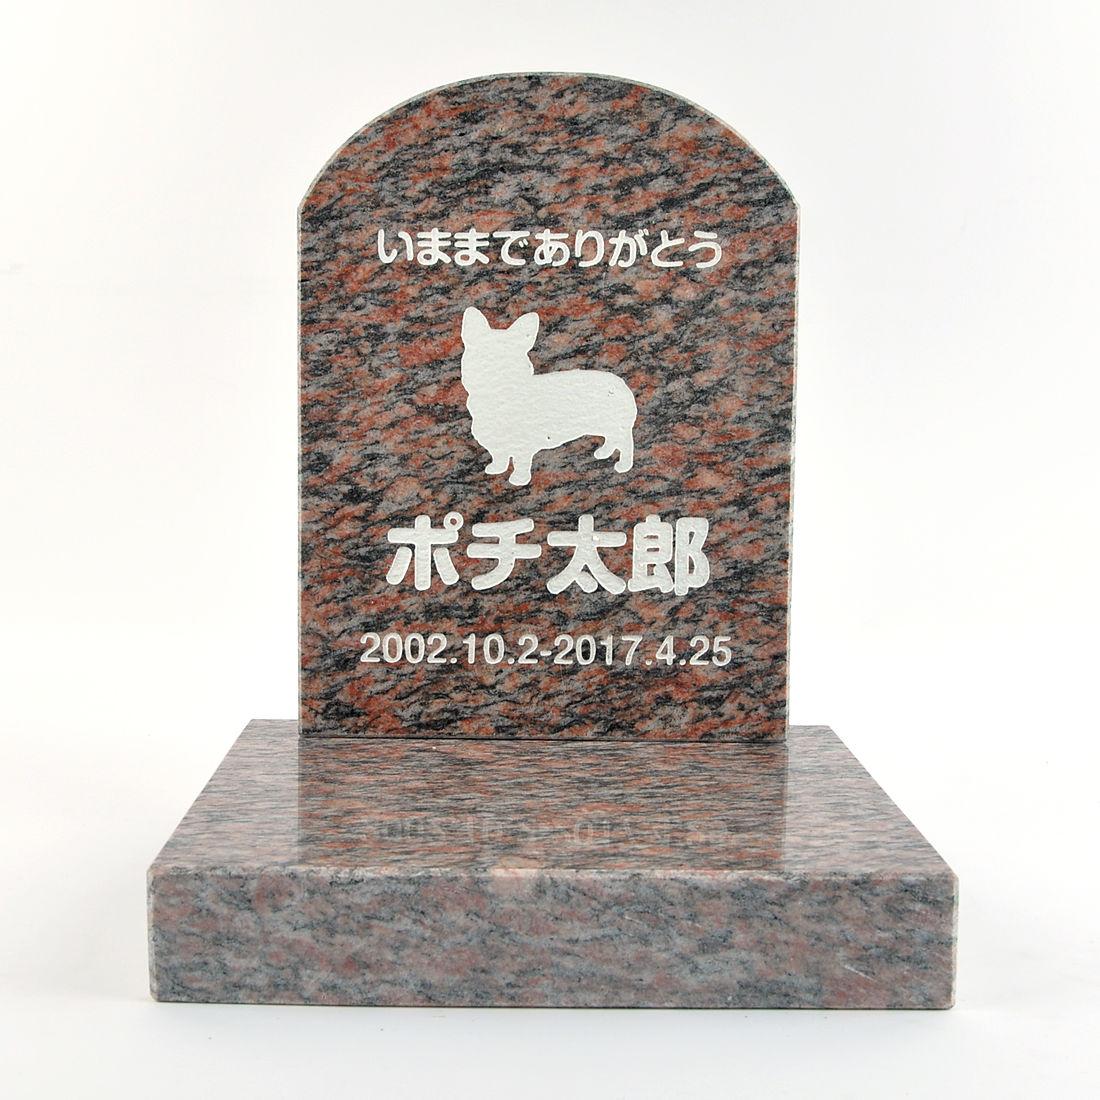 Pet&Love. ペットのお墓 天然石製 セット型 底板が厚く重いタイプ 御影石 レッド スタンダード  【HLS_DU】【楽ギフ_名入れ】 attr177attr ctgr2ctgr sml3sml+ctgr2ctgr DOG